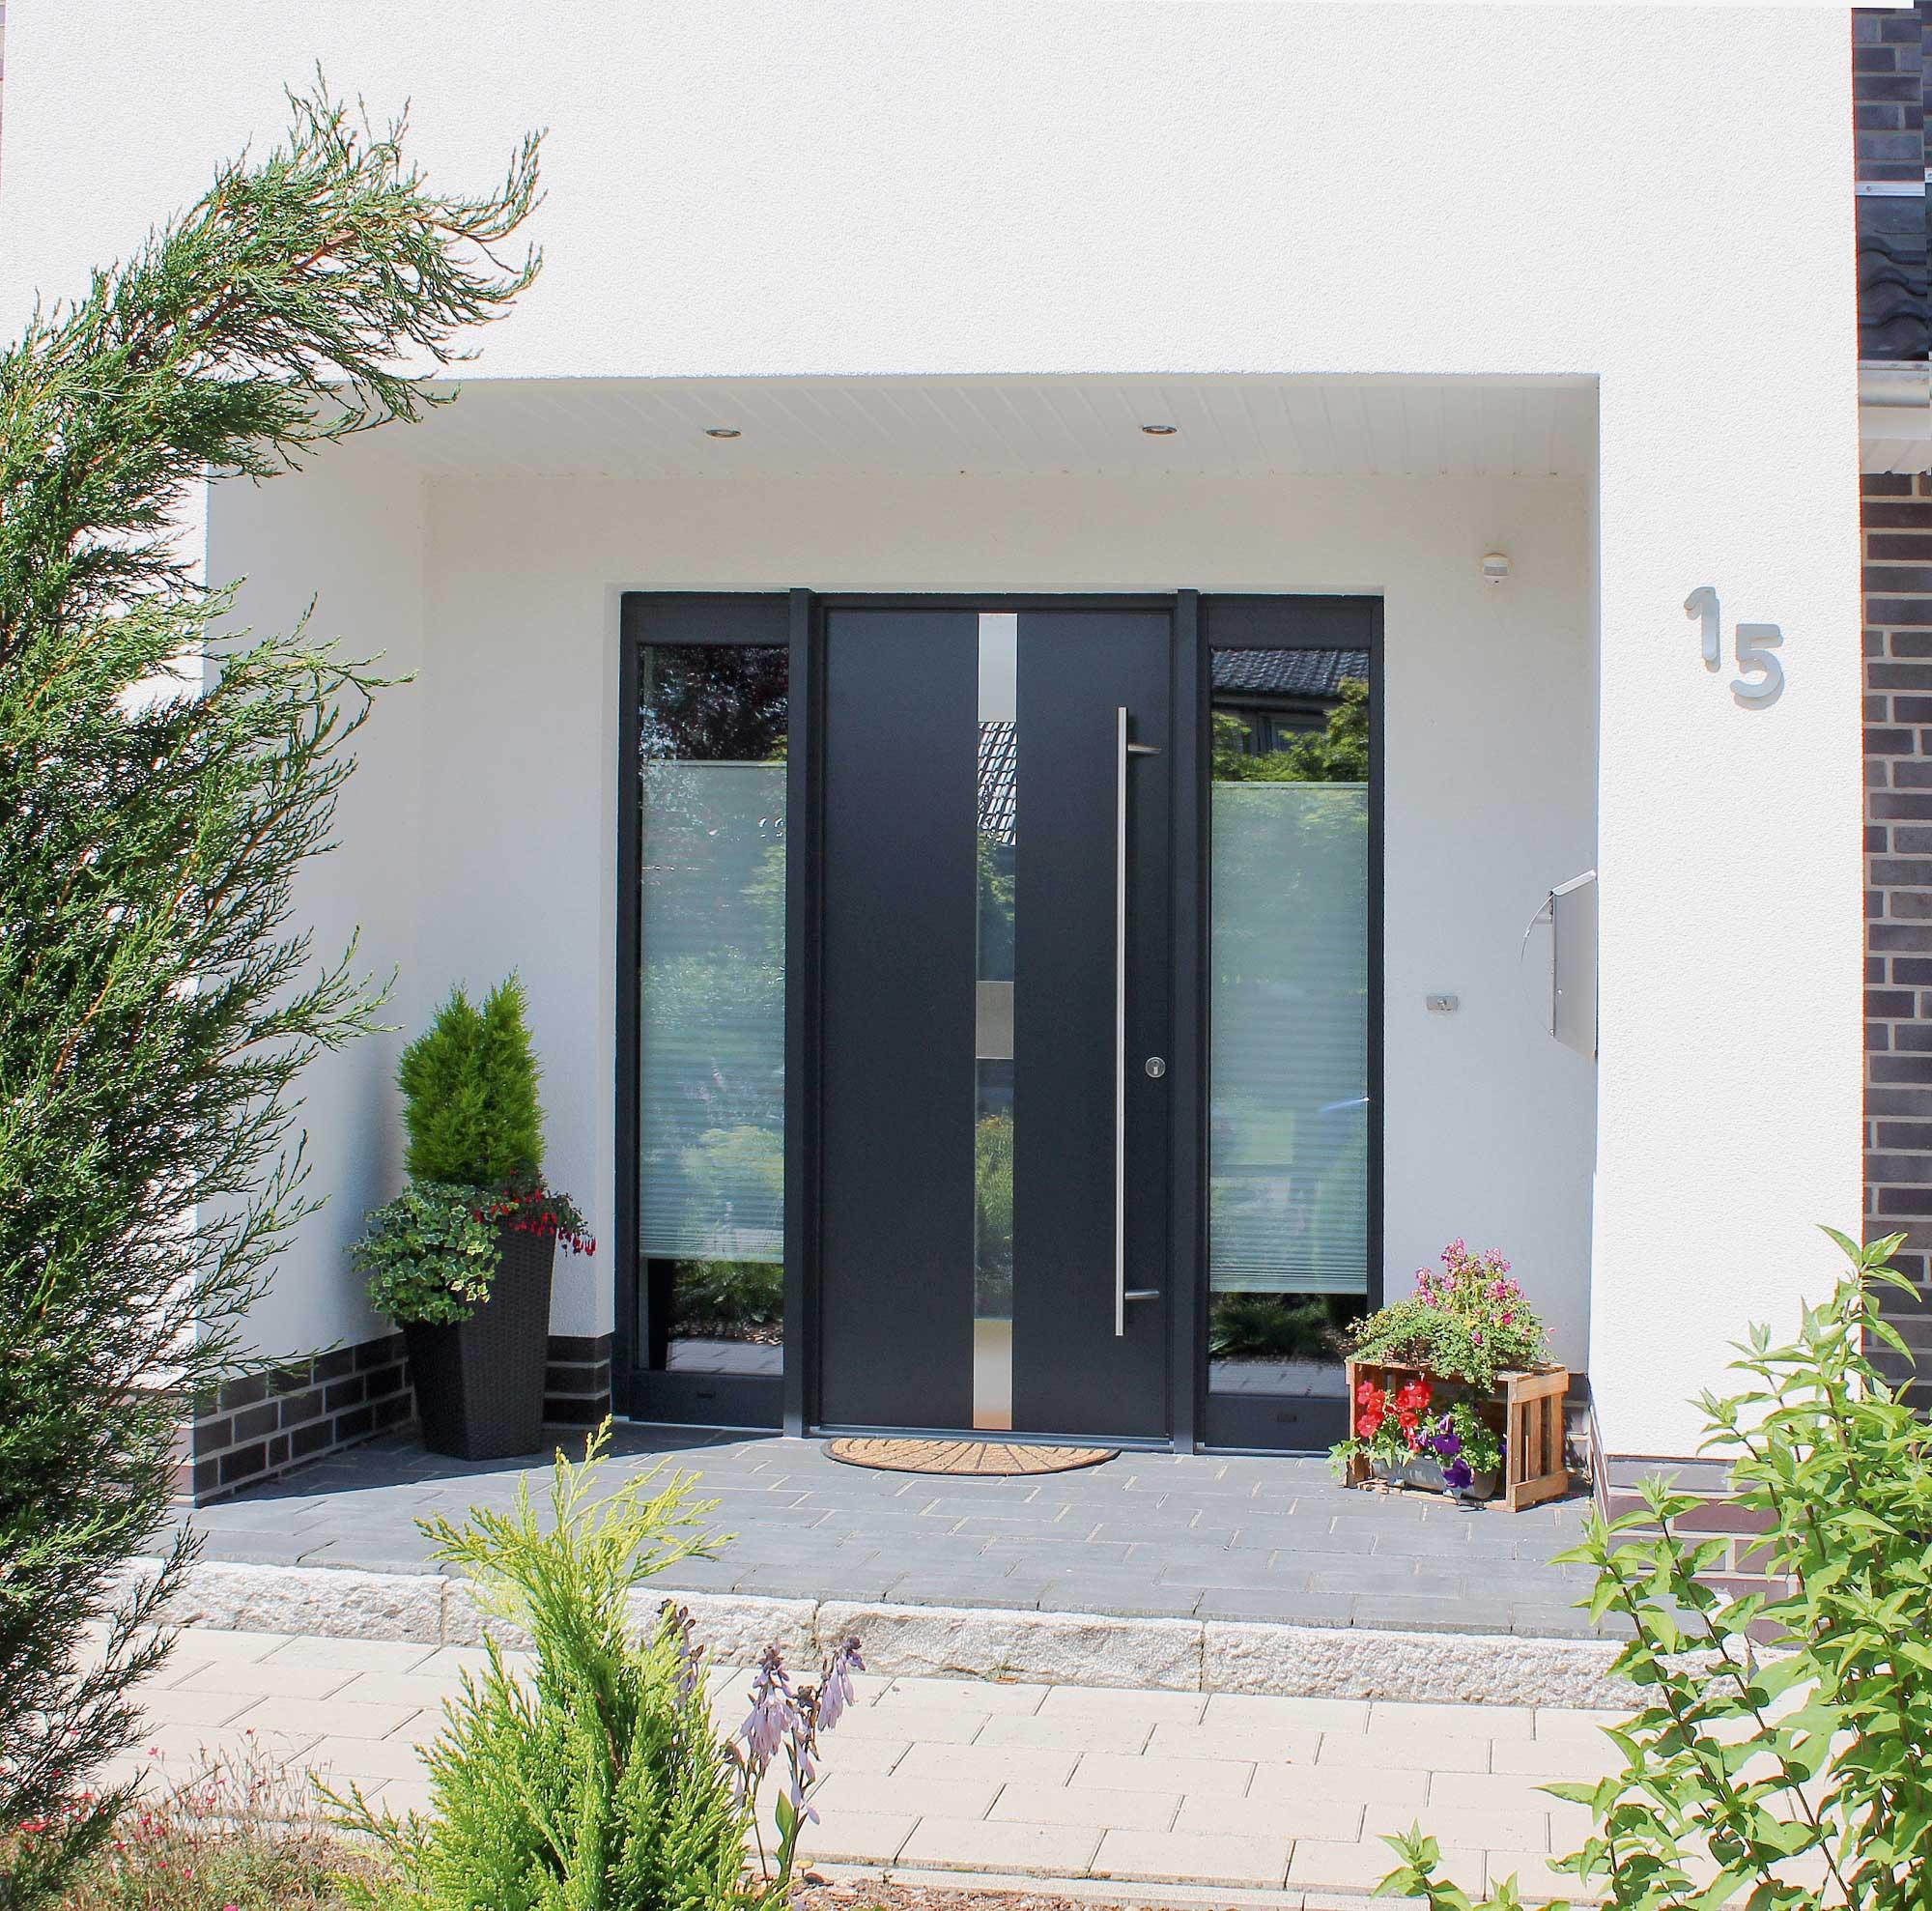 wohnraum stadtvilla 150 qm. Black Bedroom Furniture Sets. Home Design Ideas